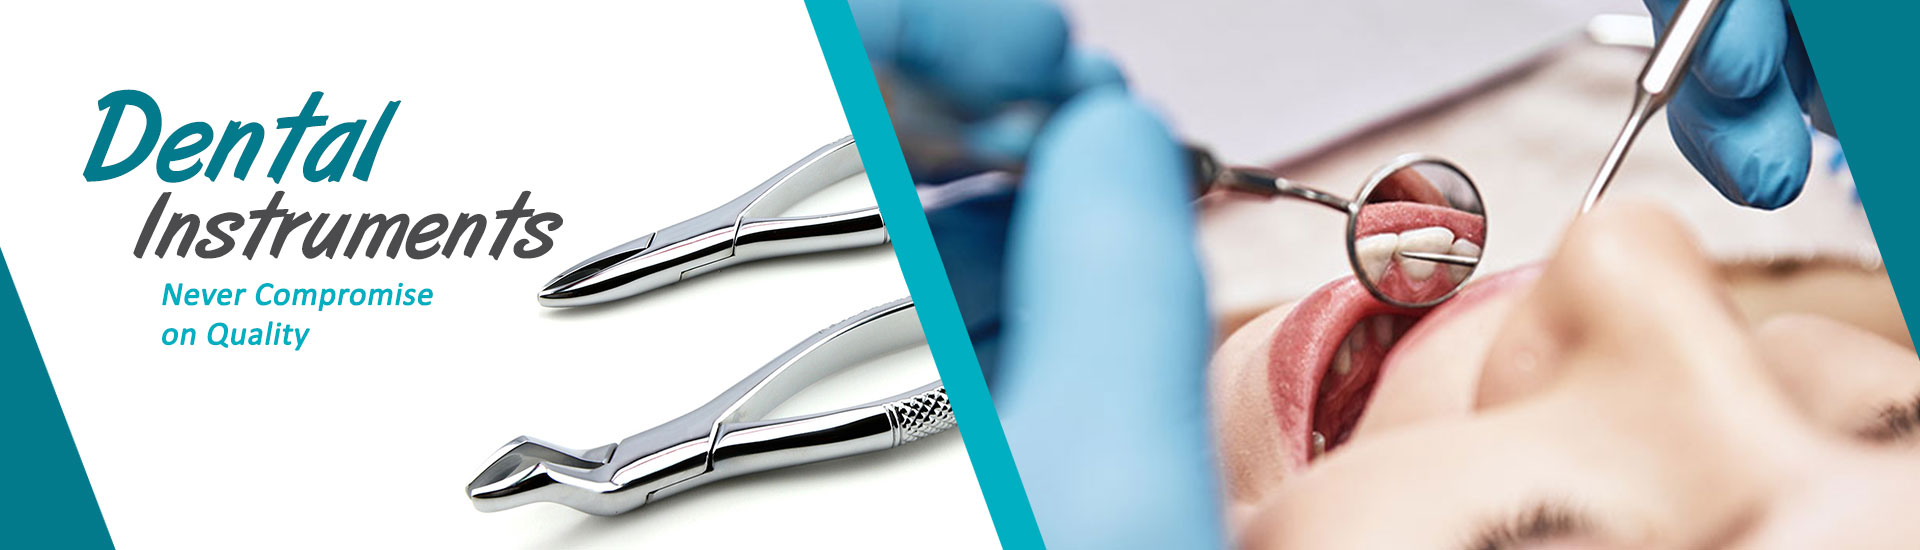 Dental-Instruments